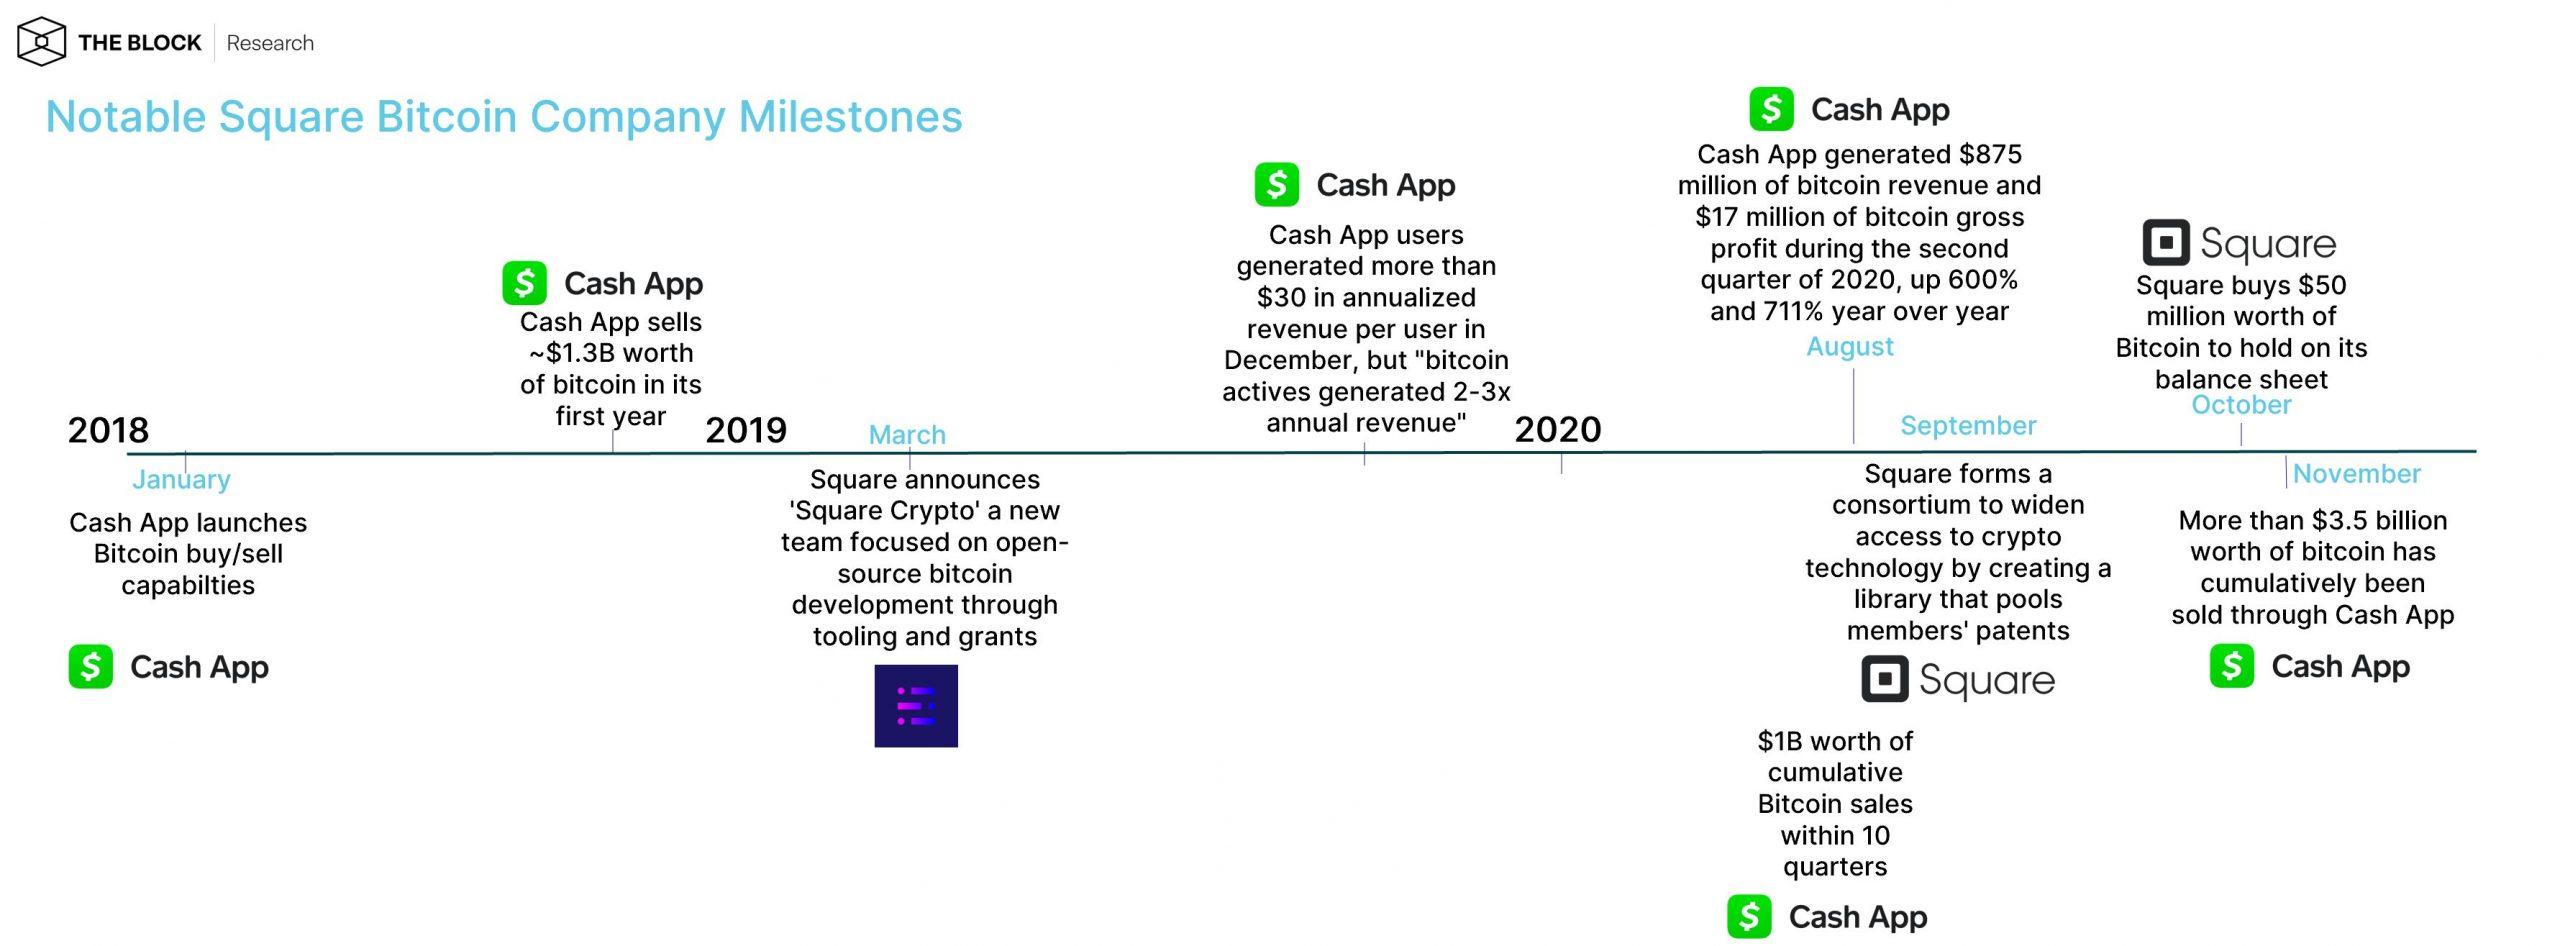 Square Bitcoin timeline